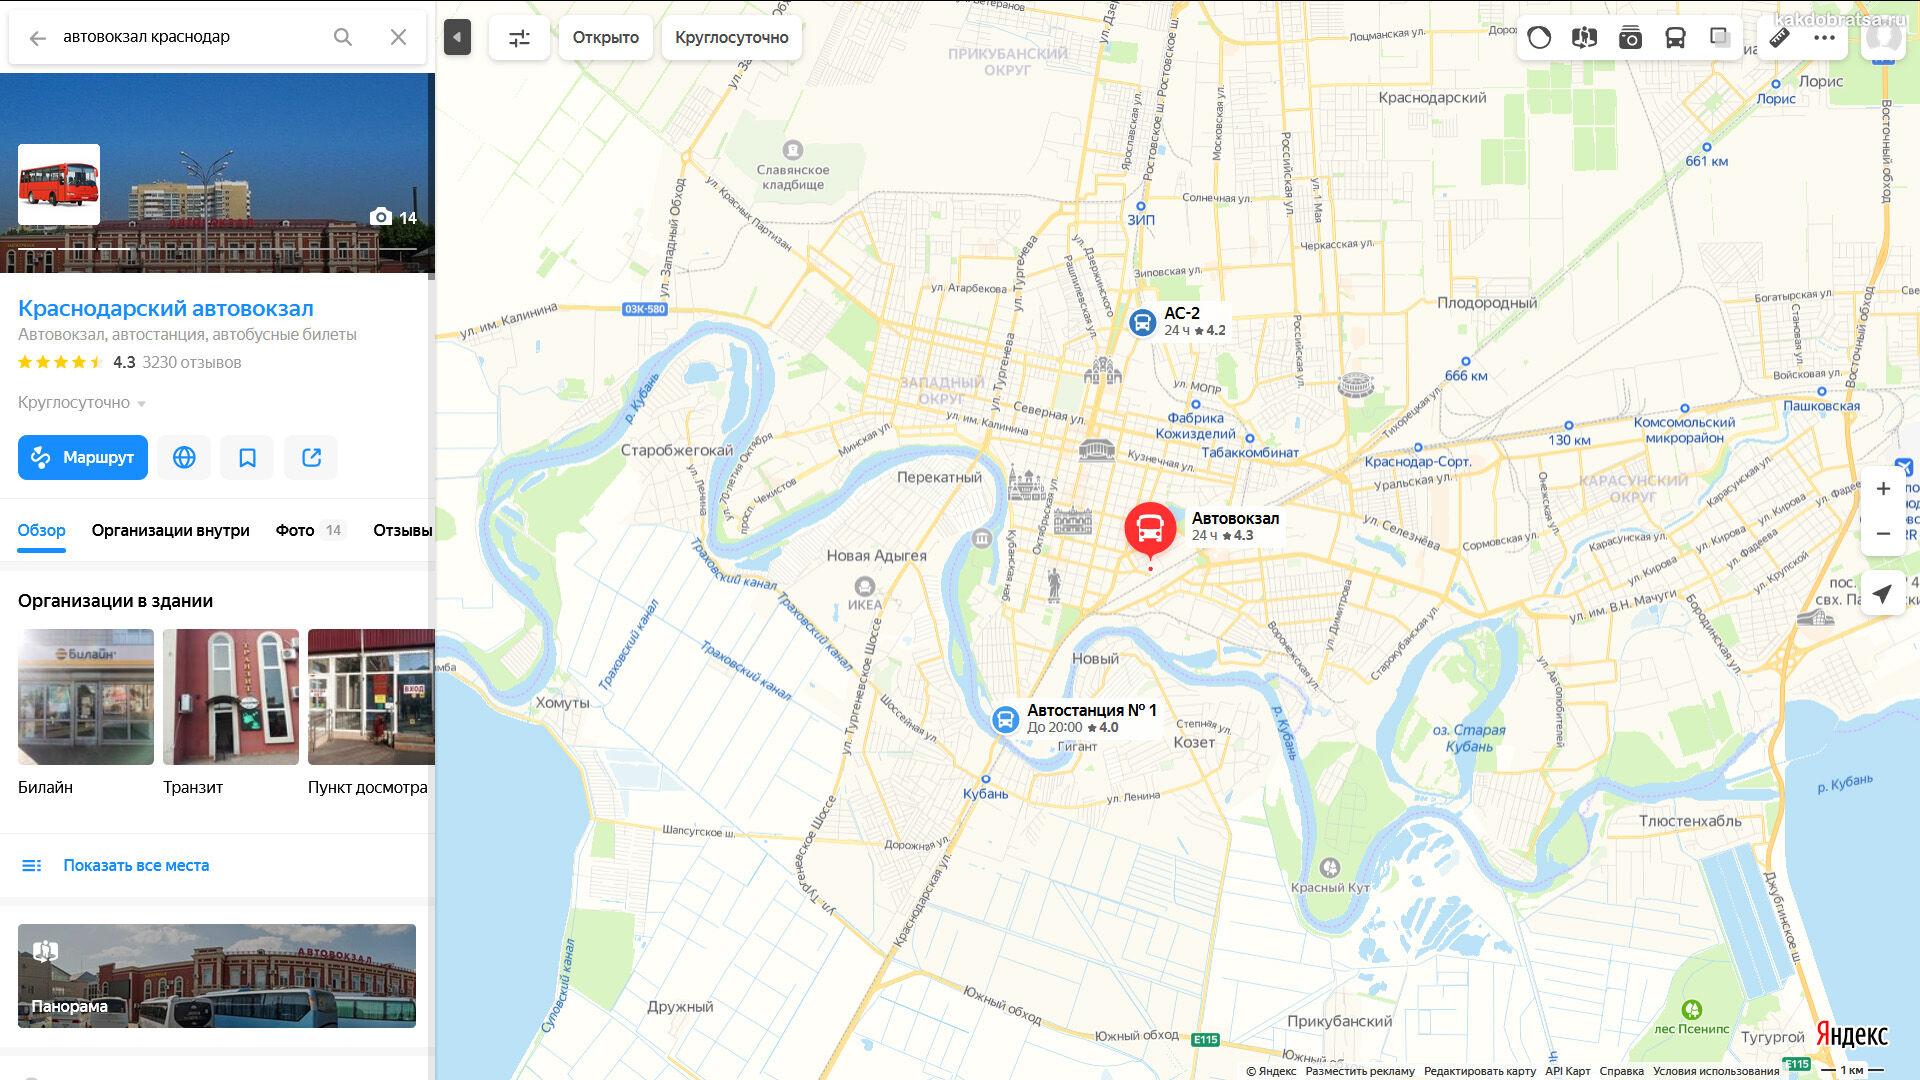 Автовокзалы Краснодара на карте